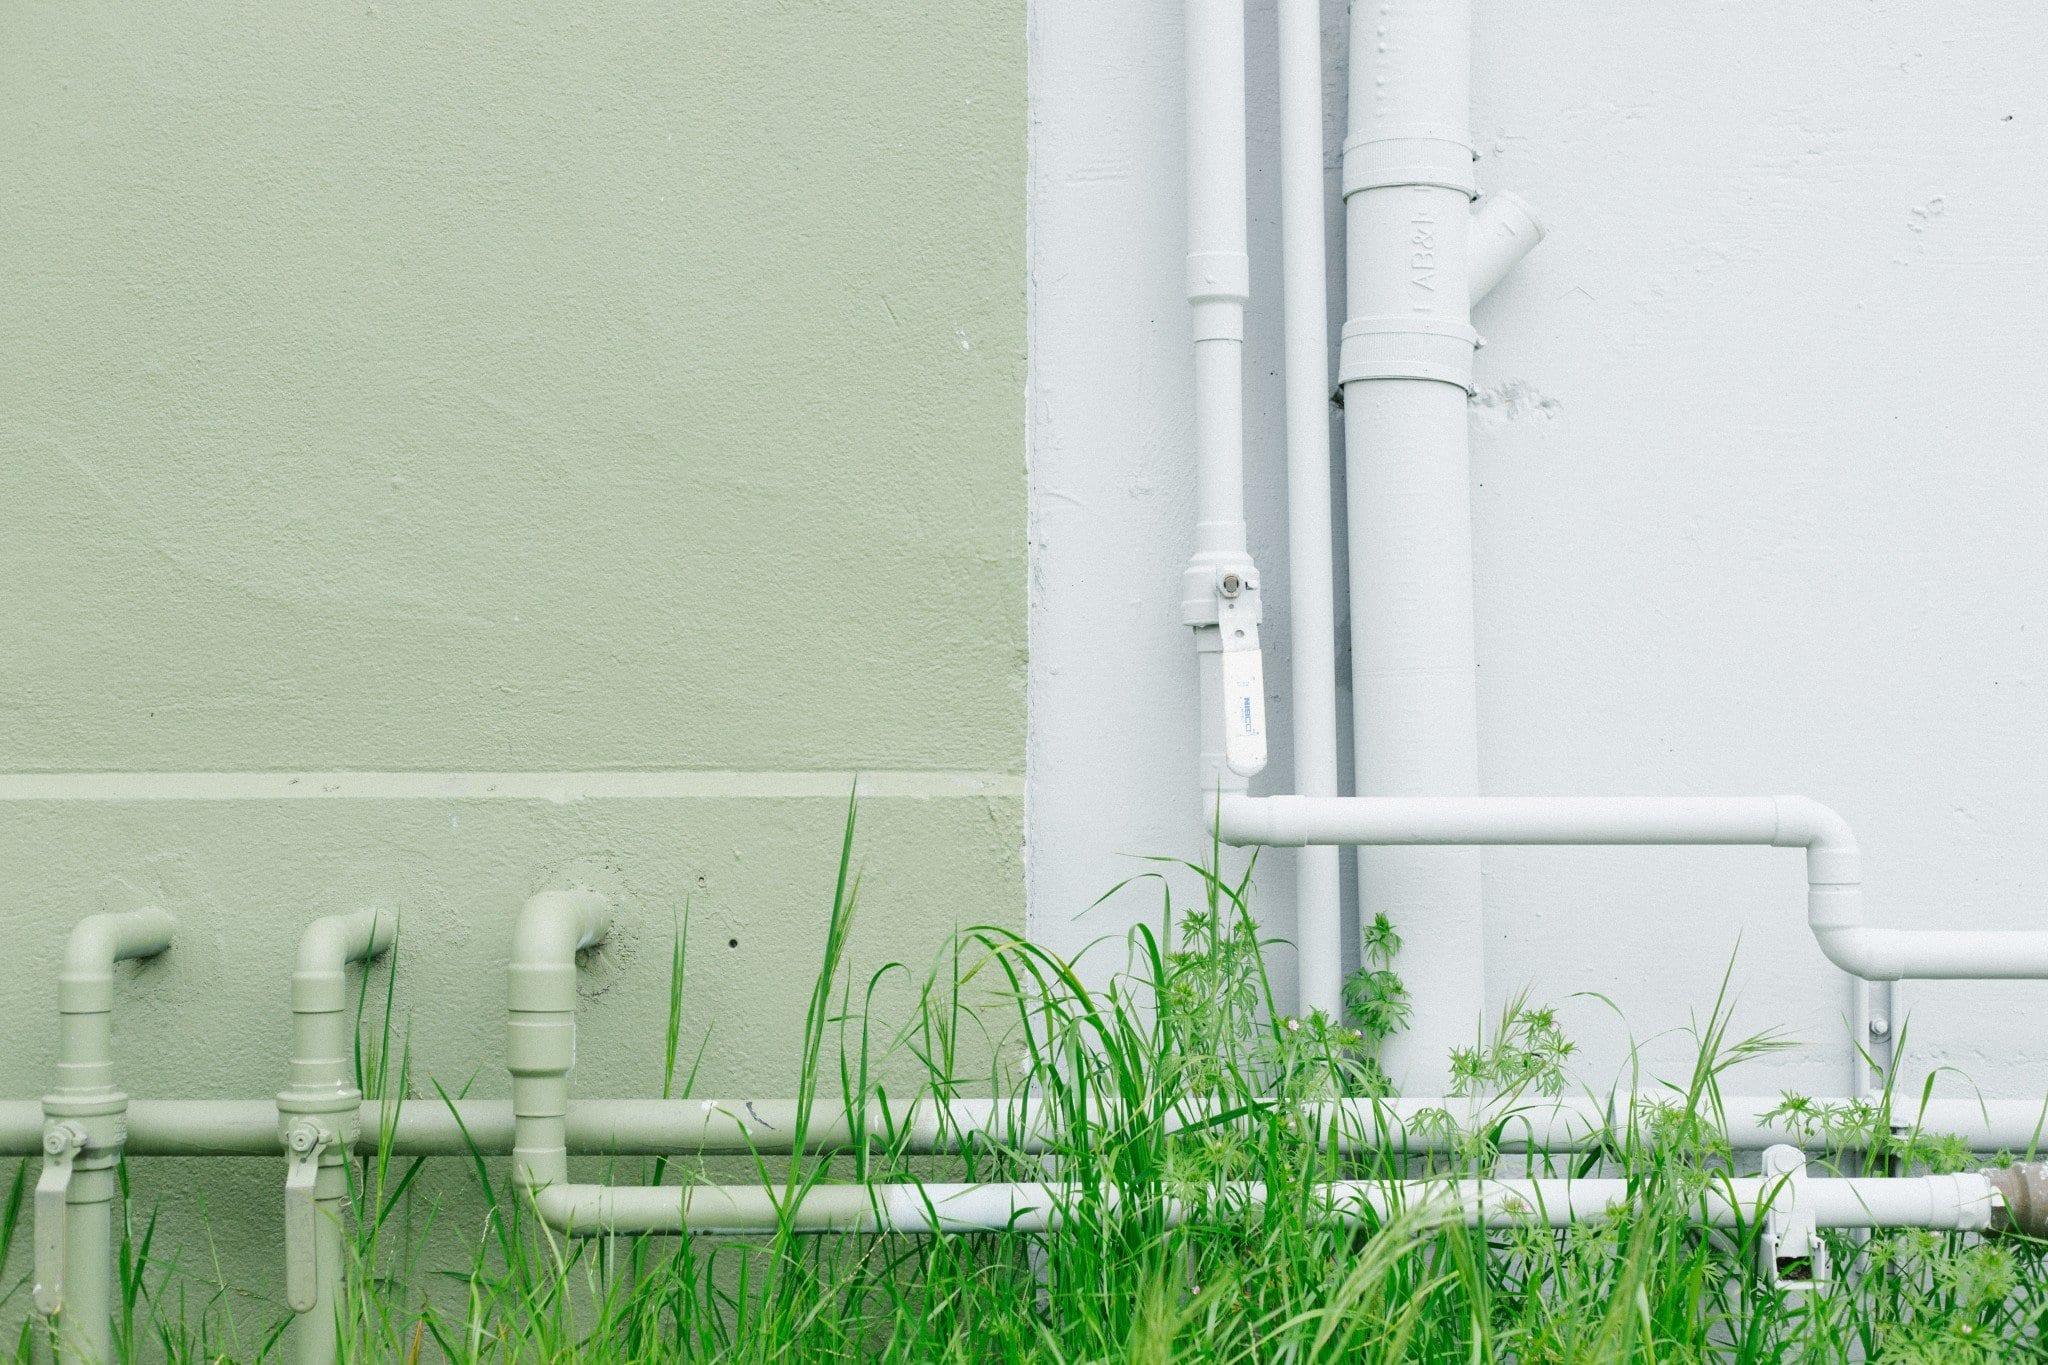 home shut off valve